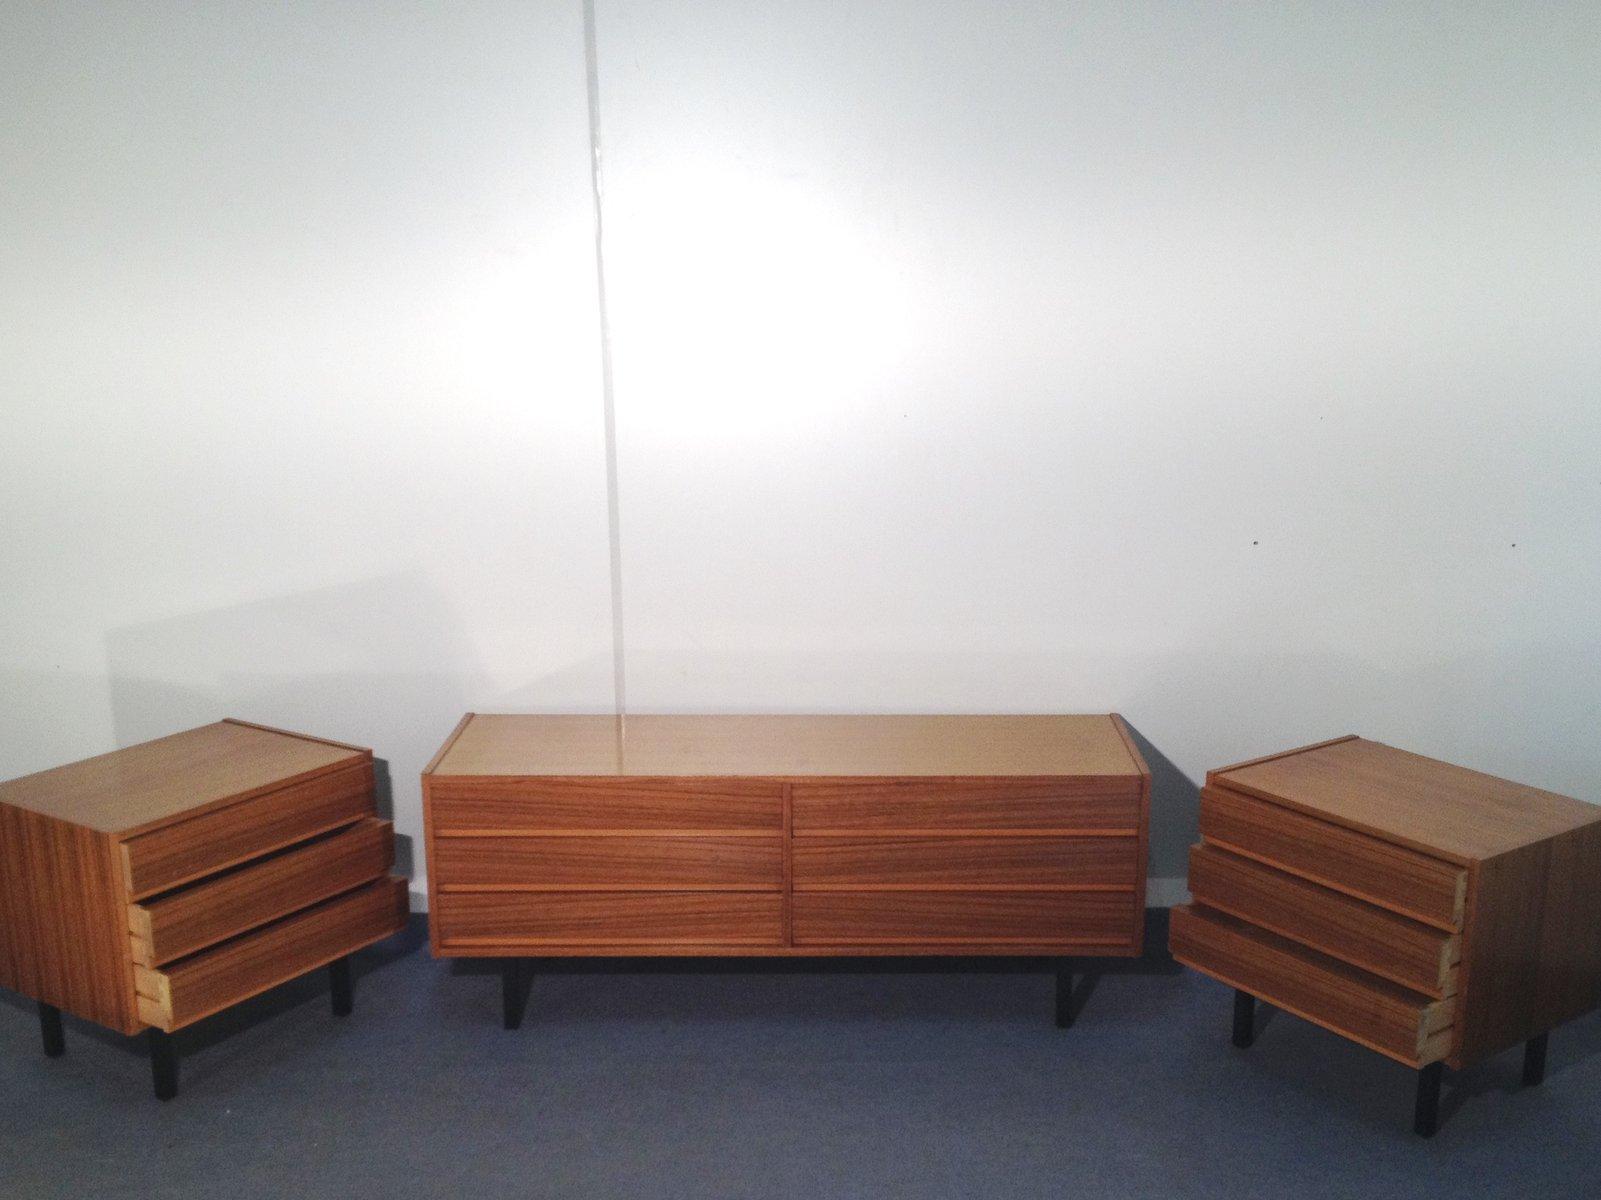 Skandinavisches mahagoni sideboard 3er set bei pamono kaufen for Skandinavisches sideboard